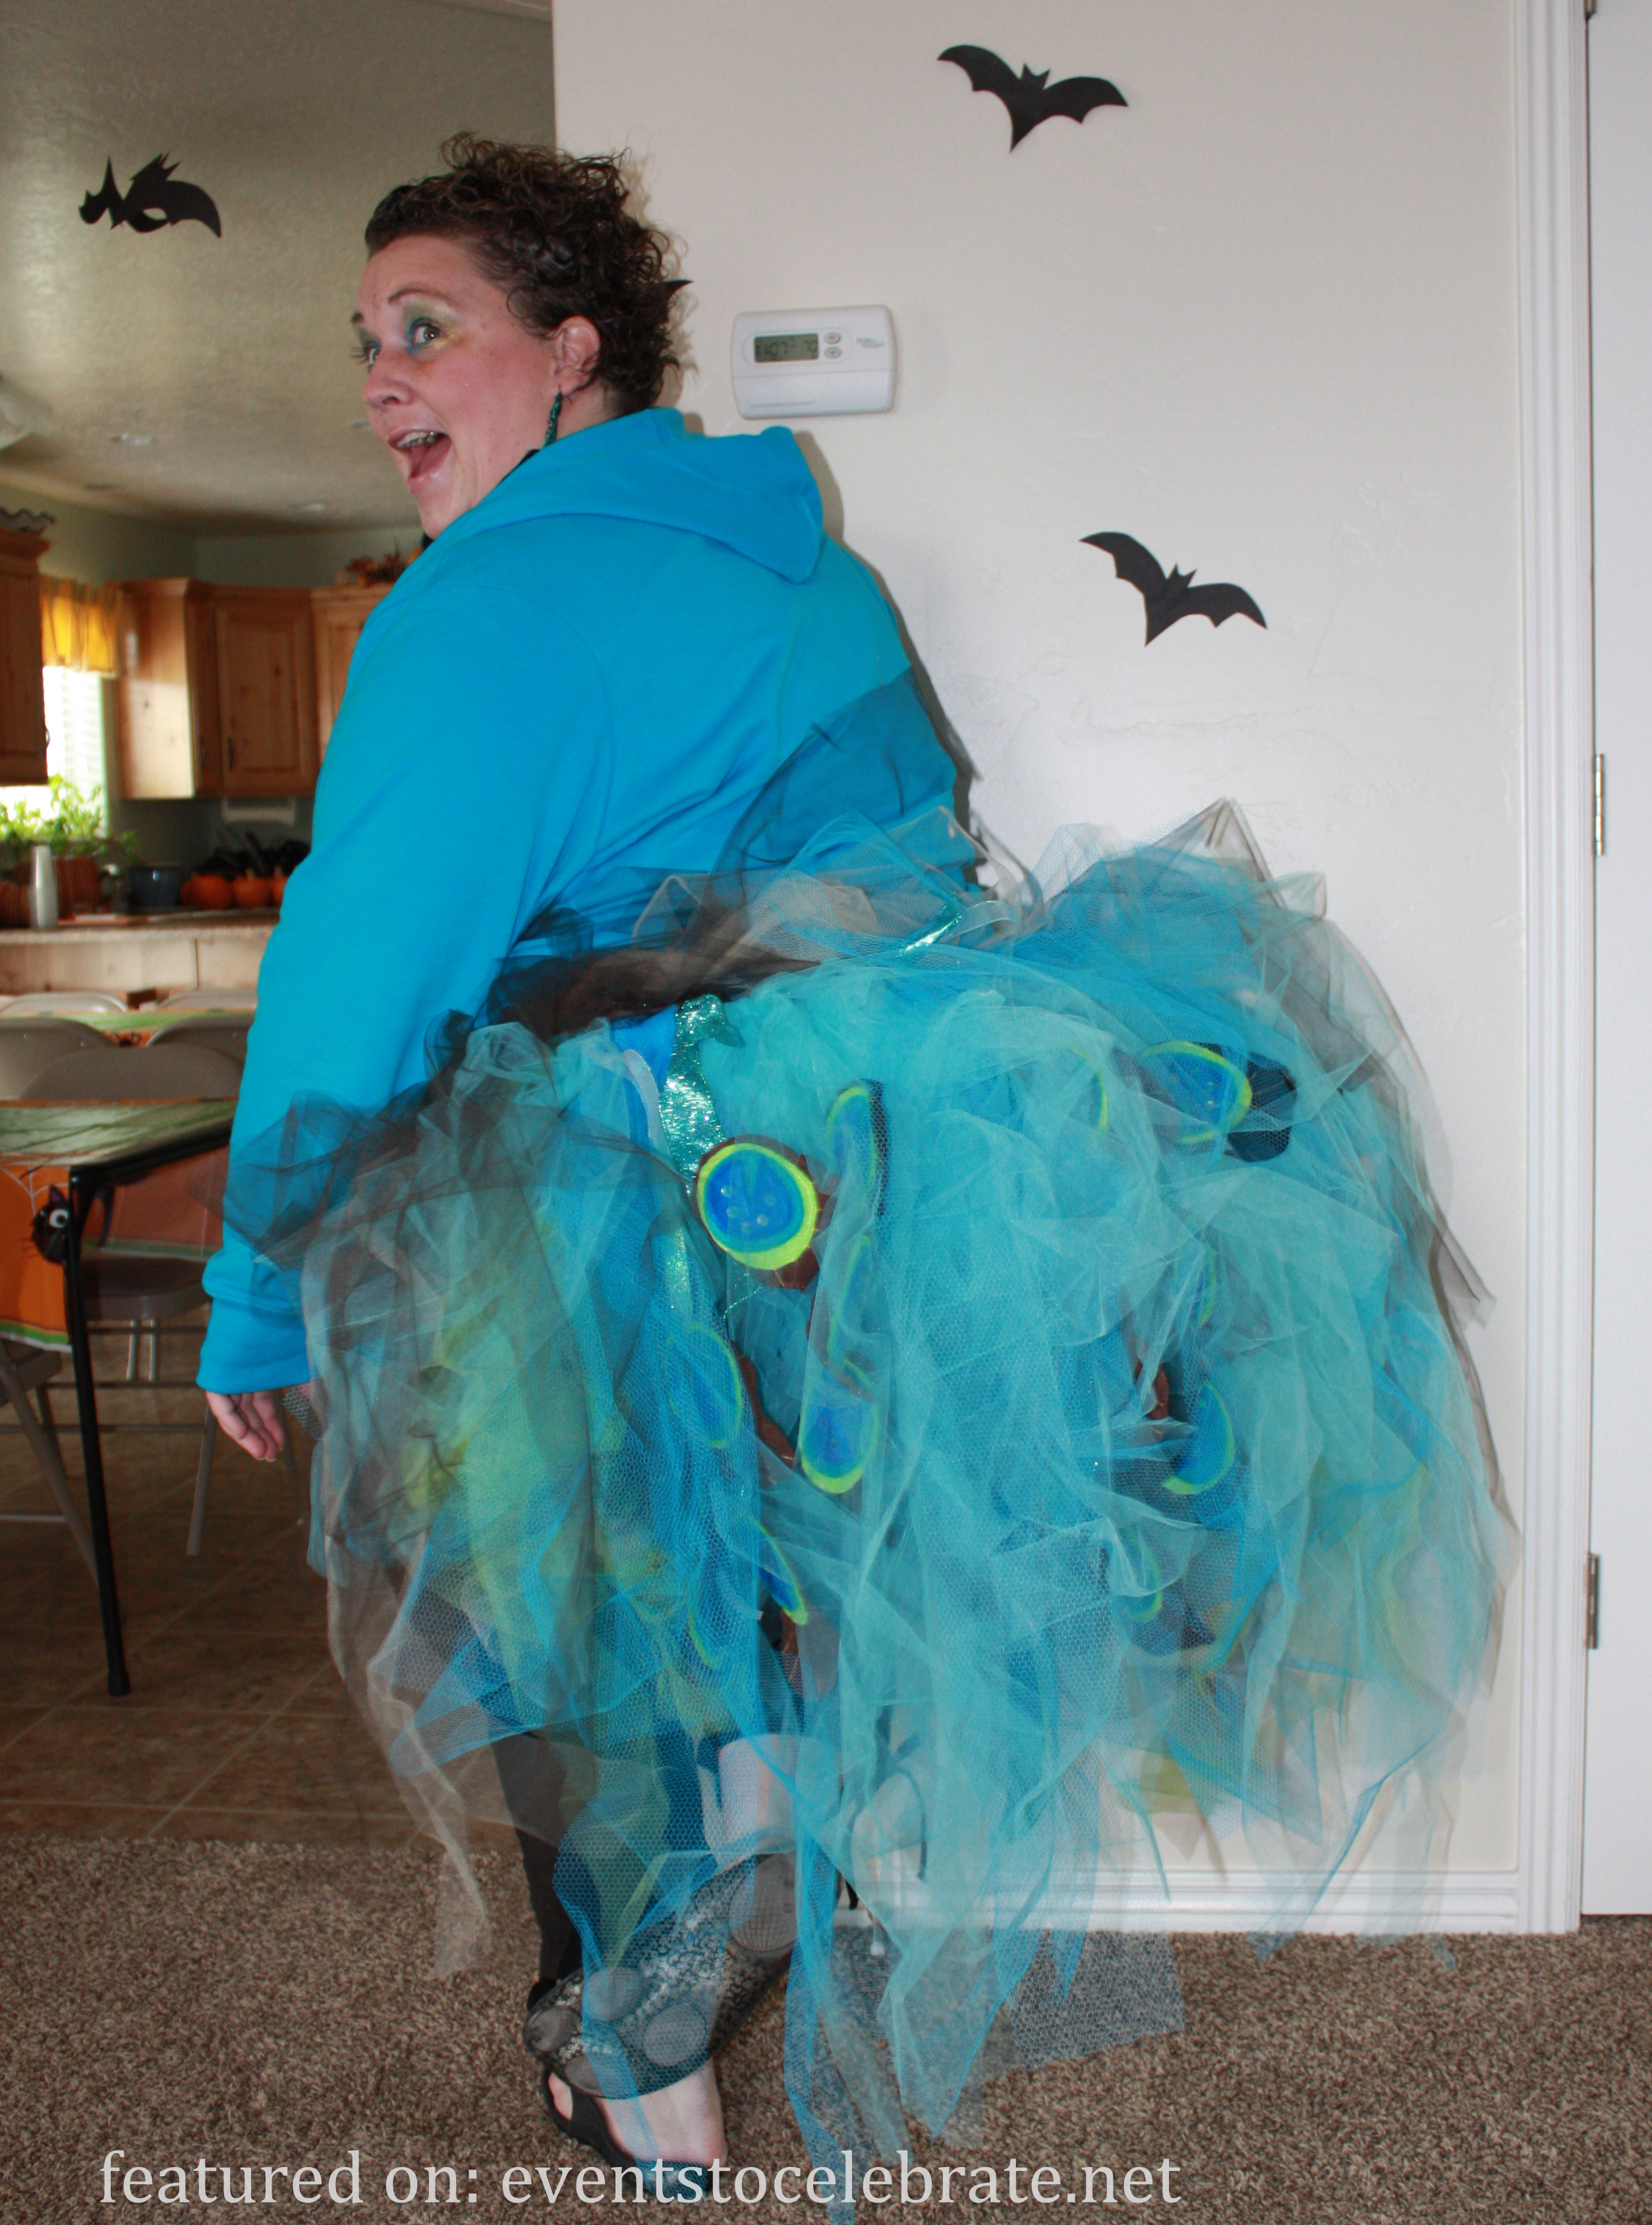 peacock halloween costume - events to celebrate!